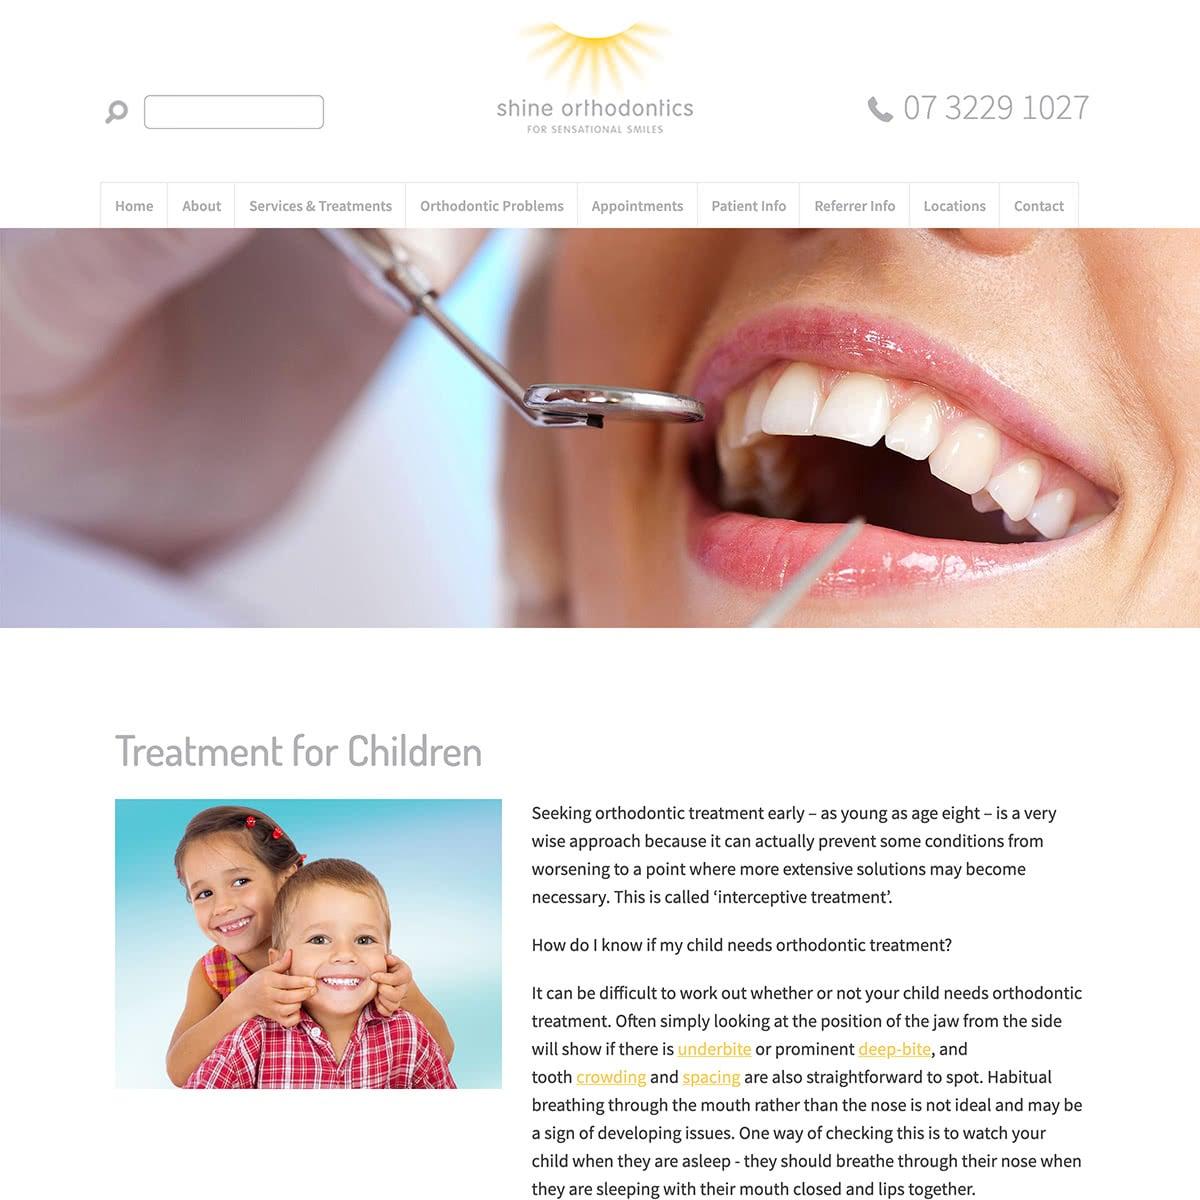 Shine Orthodontics - Services and Treatments